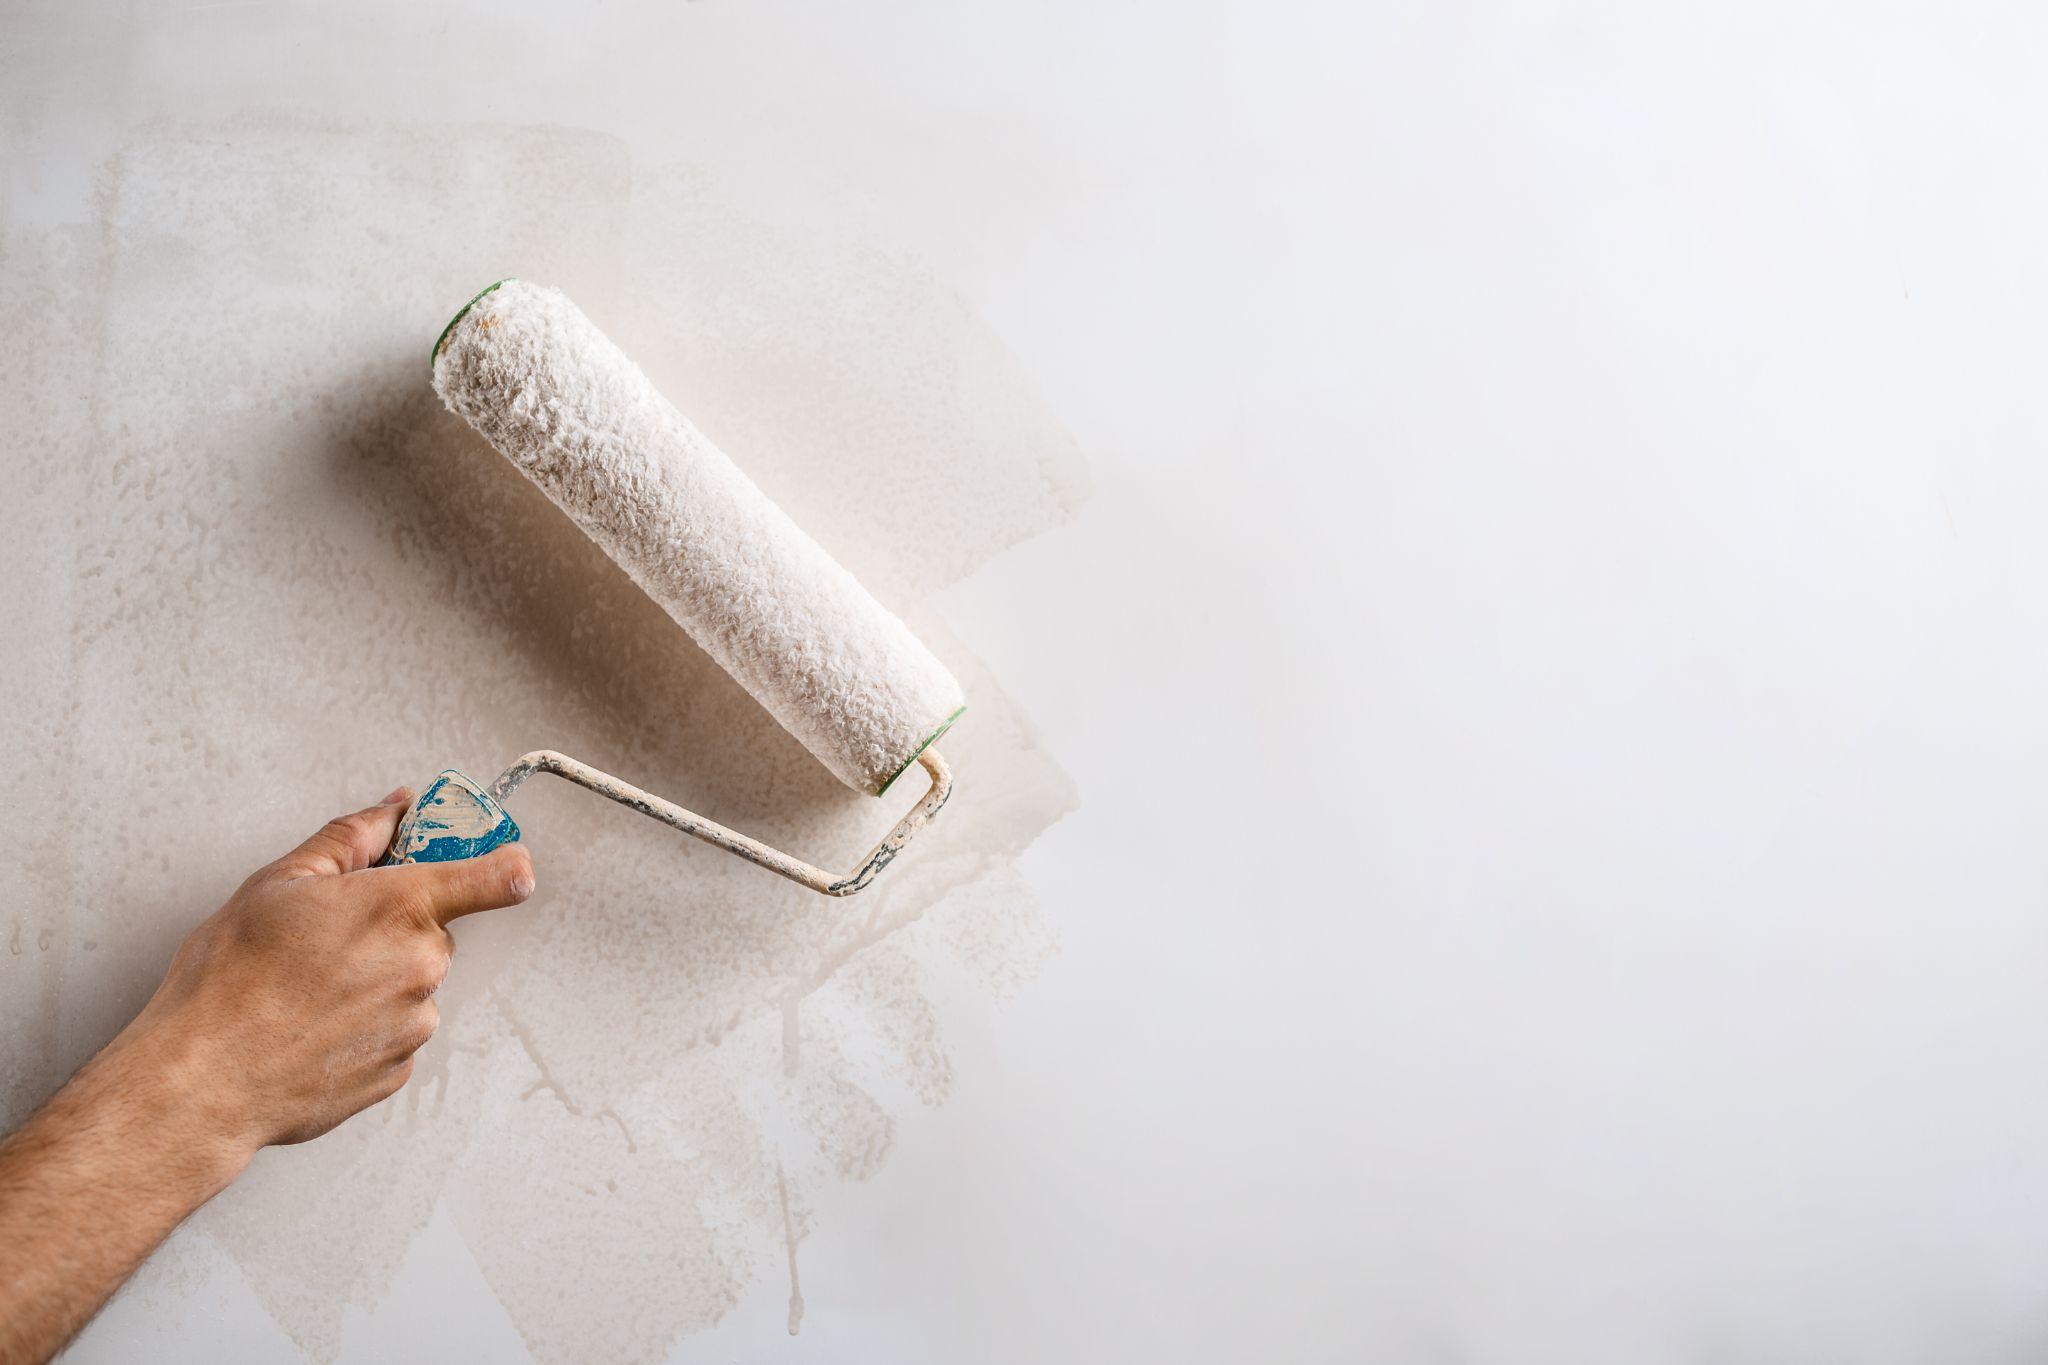 Rolo de pintura pintando parede branca